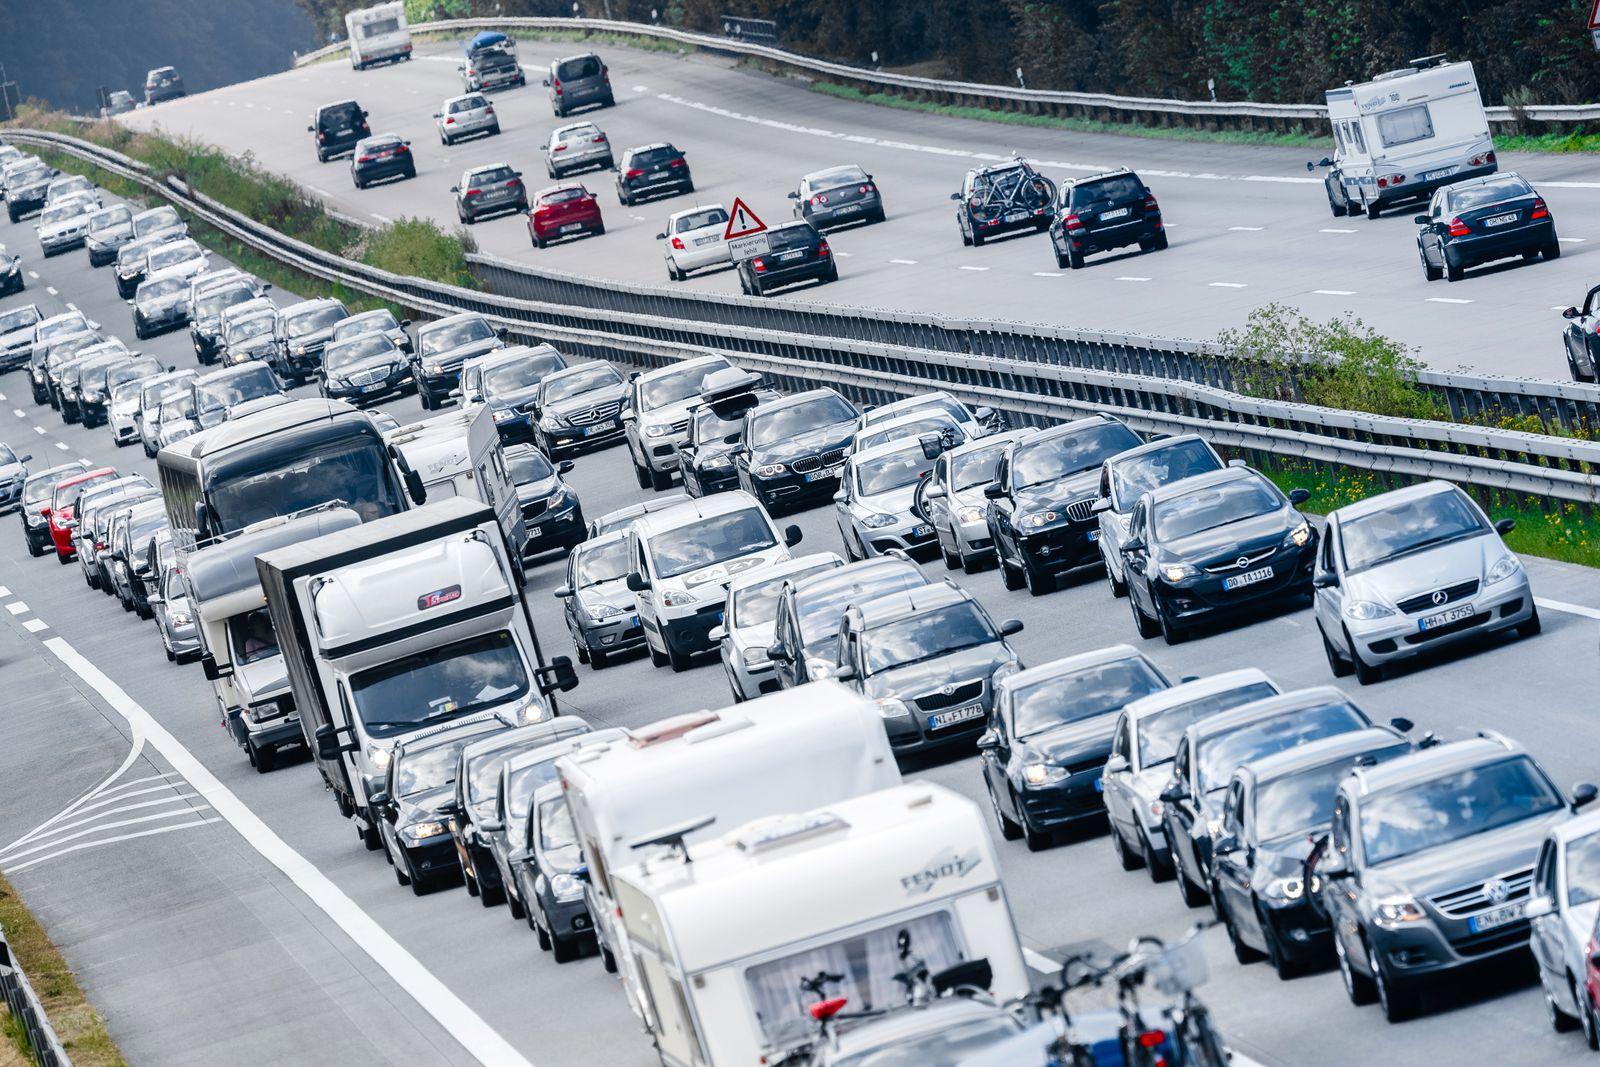 Autobahn A1 / Autobahnen